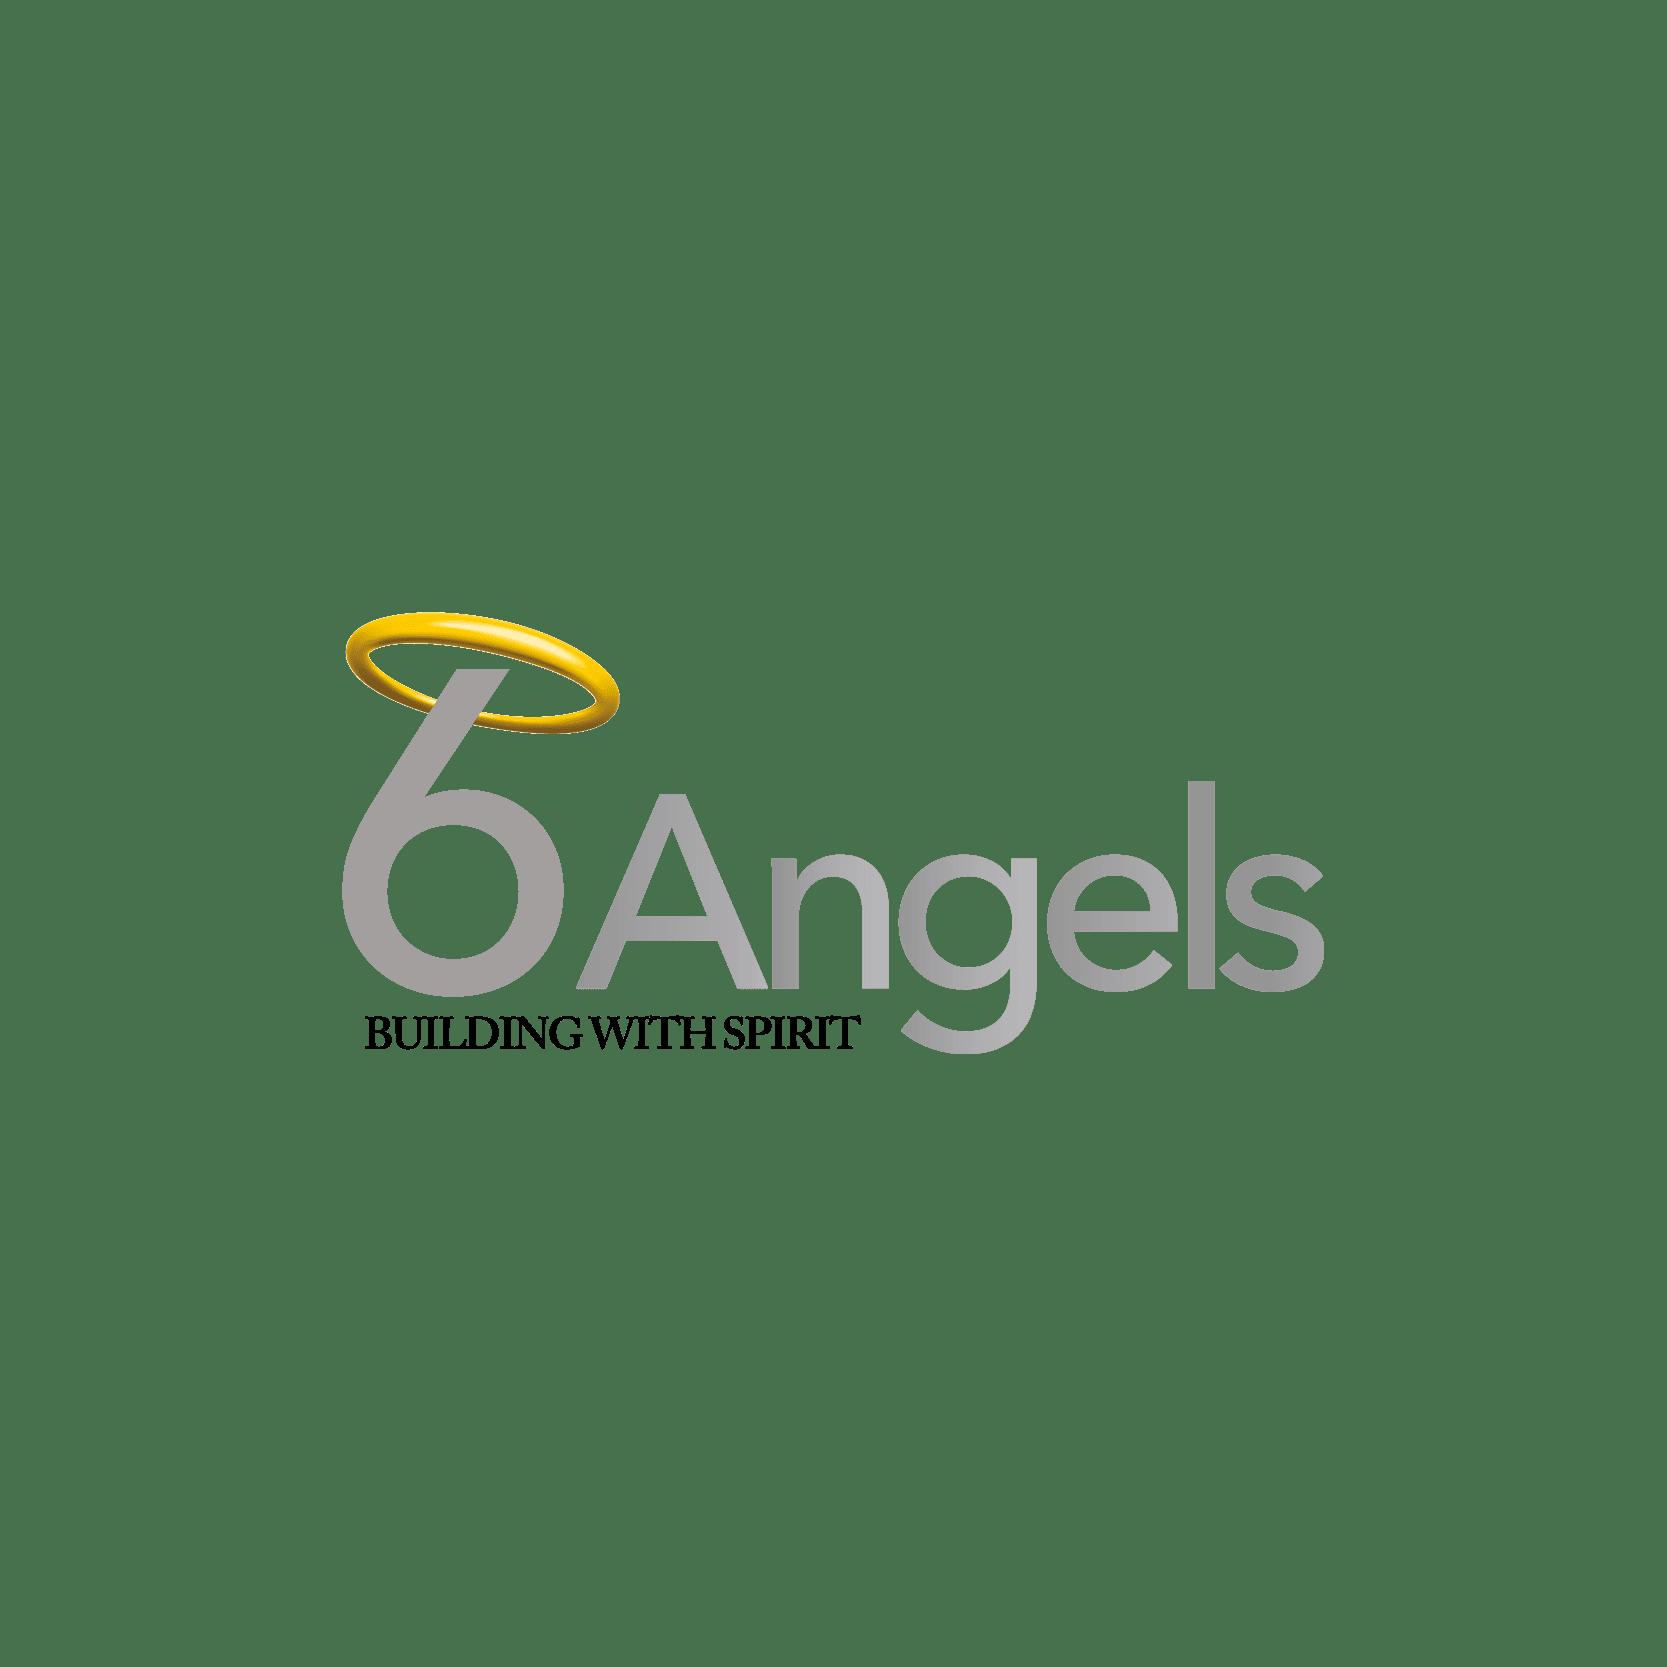 6 Angels - Wallington, London SM6 7DJ - 020 3858 7496 | ShowMeLocal.com